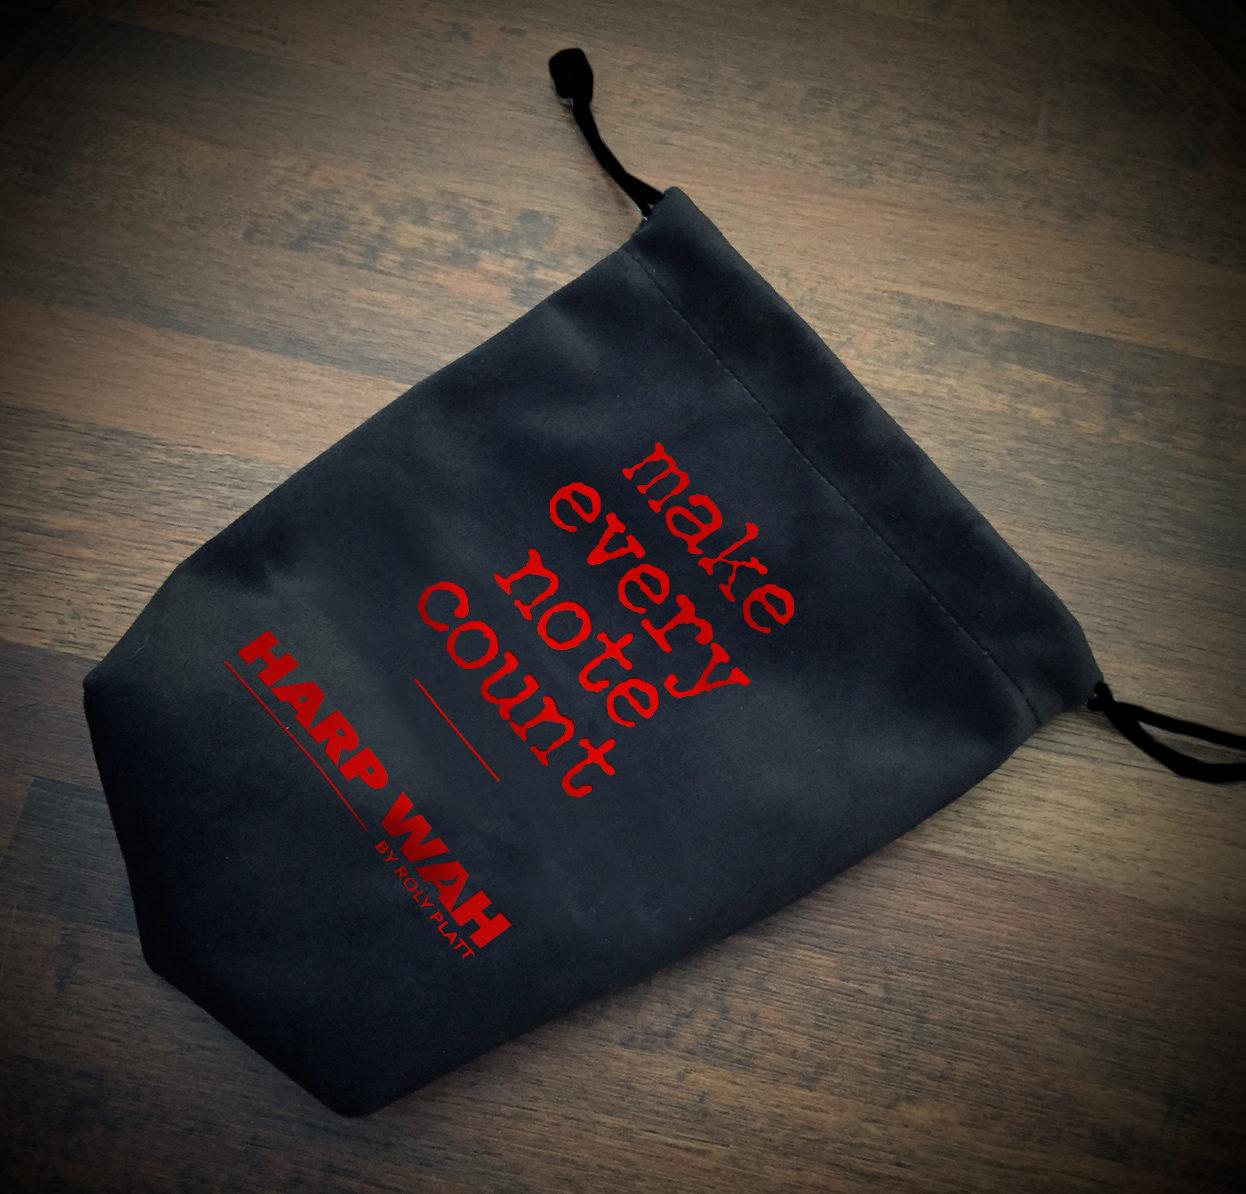 NEW: Harmonica Gear Bags